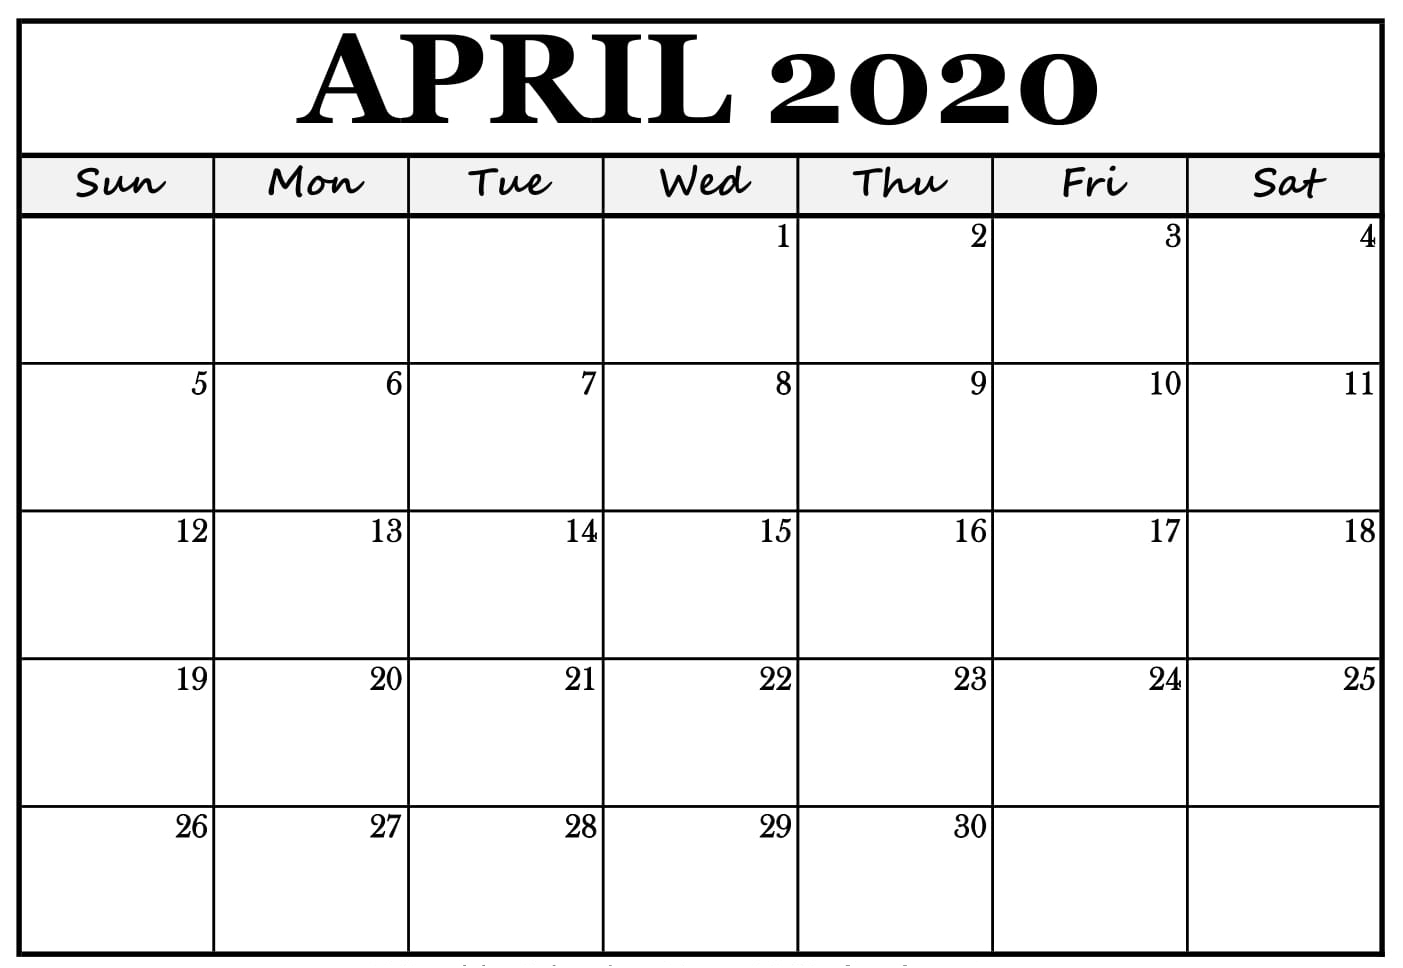 Printable April Calendar 2020 Template | Printable Calendar inside April 2020 Printable Calendar